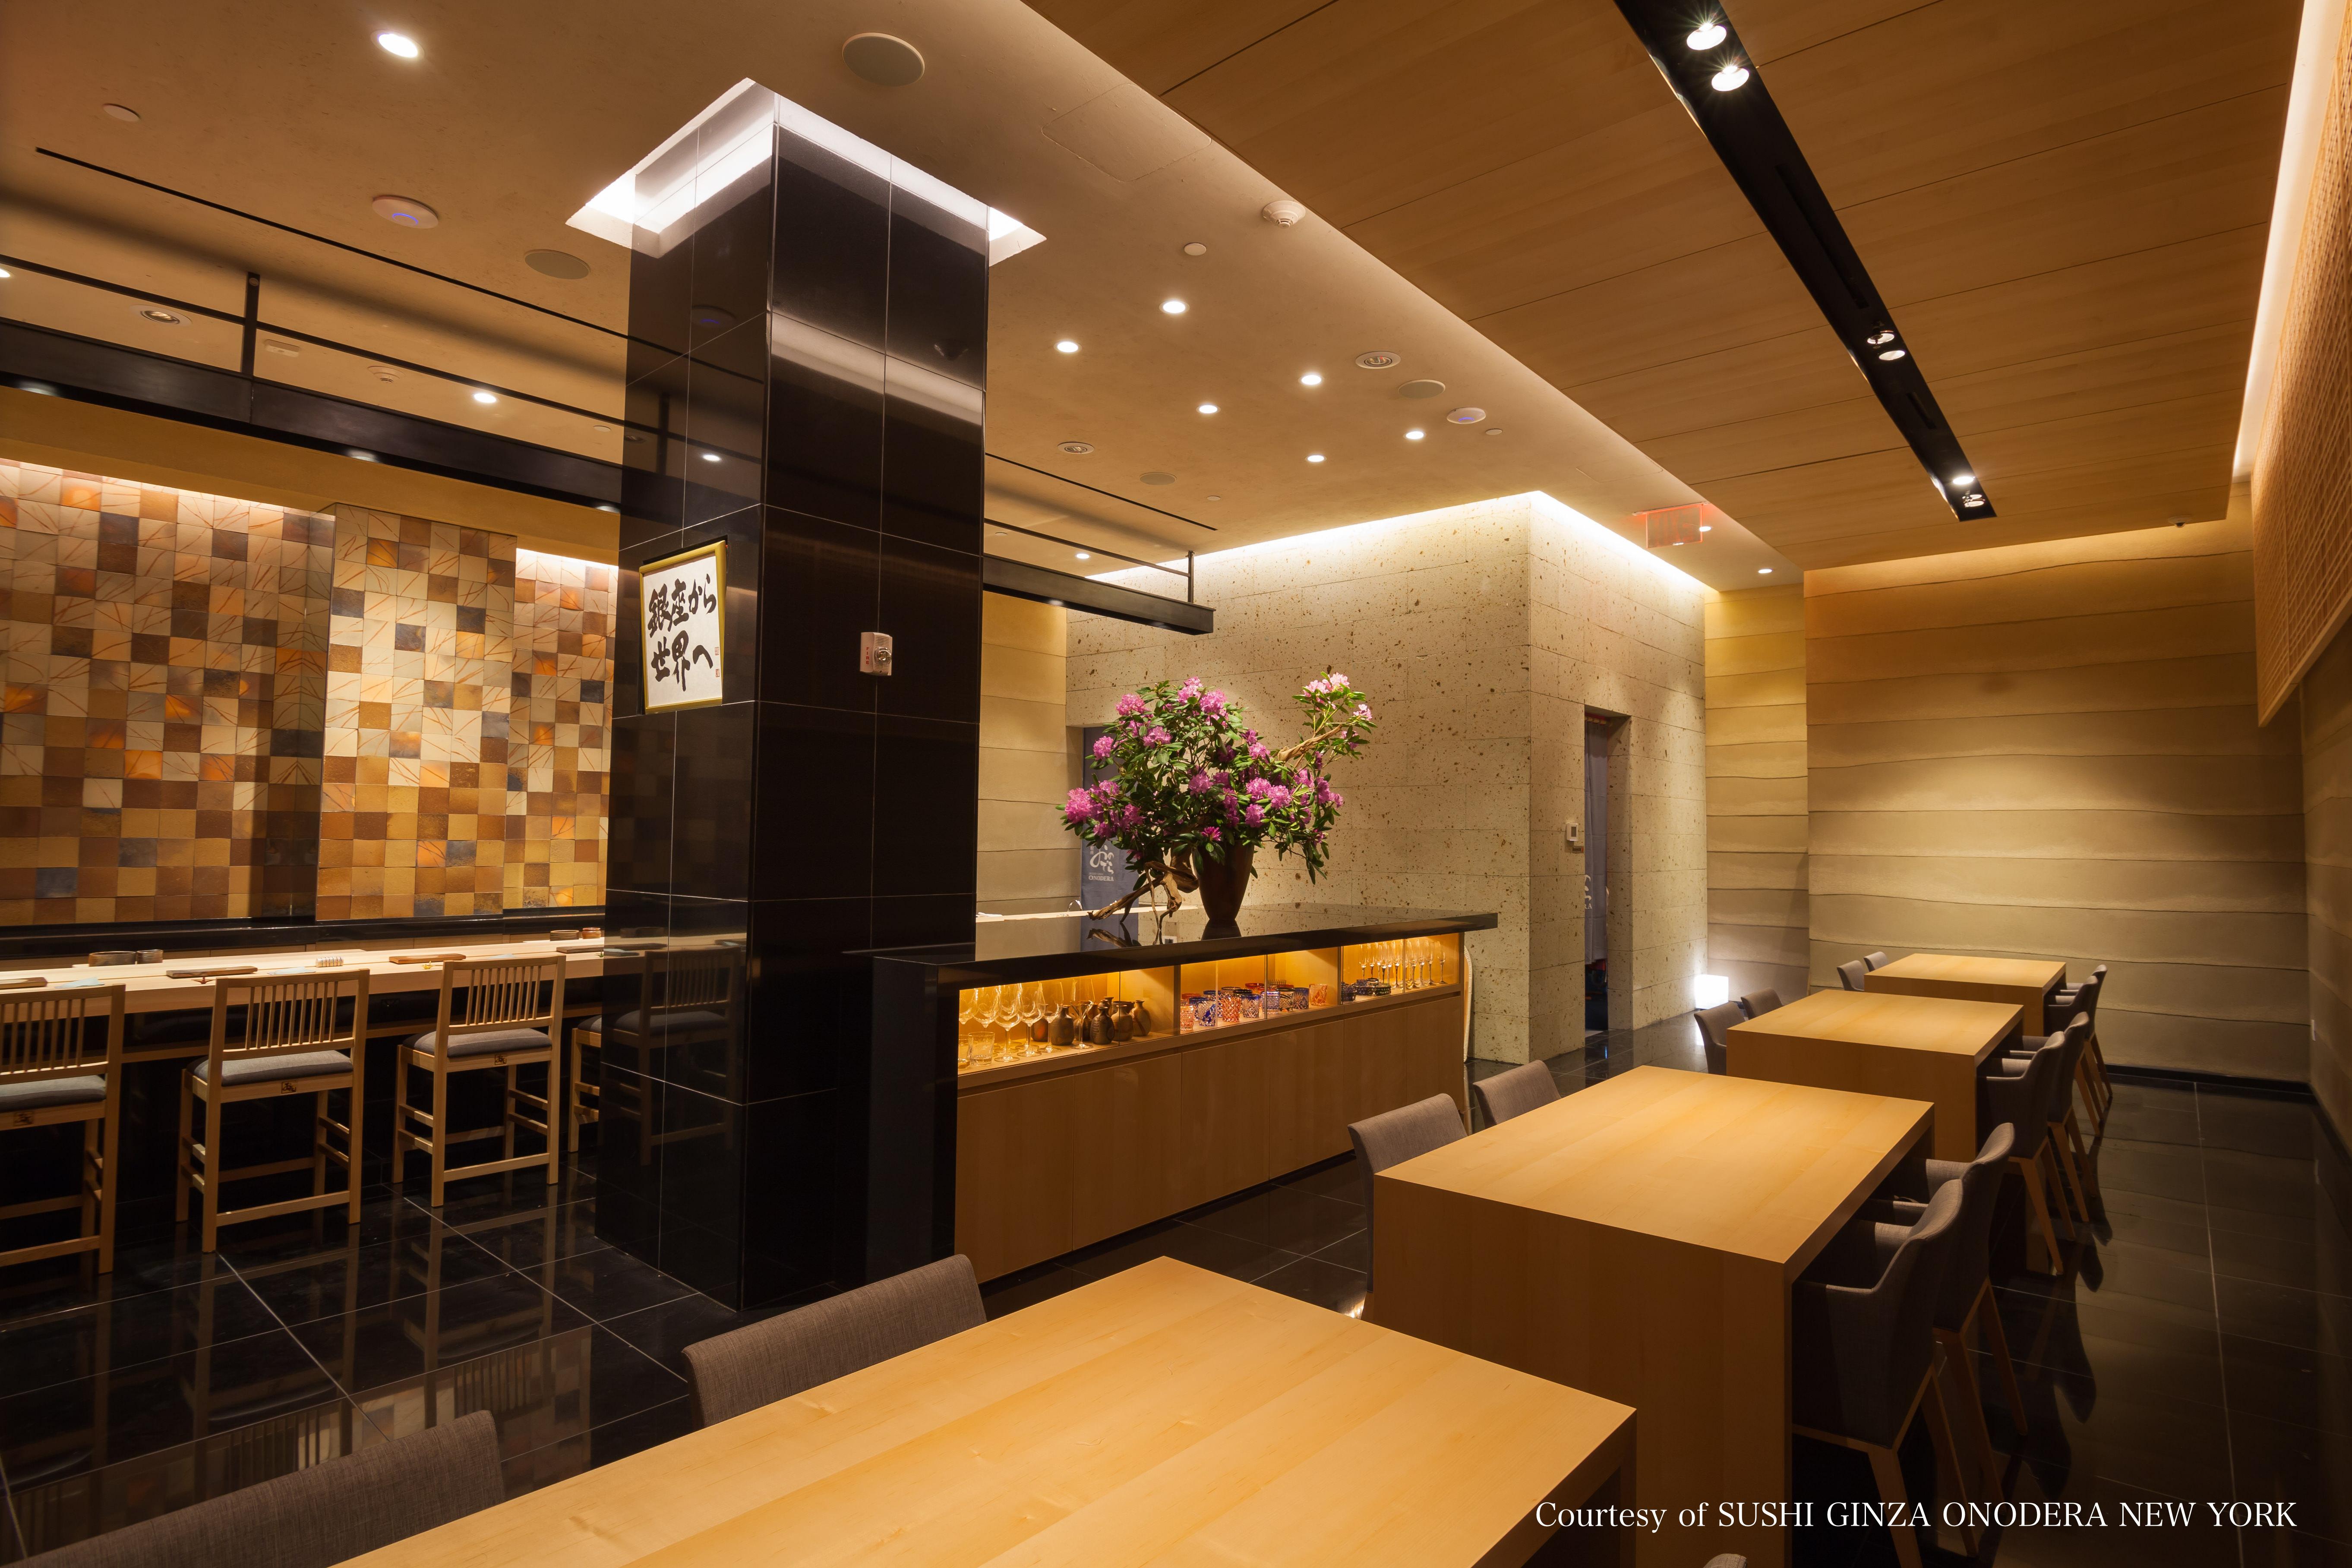 SUSHI GINZA ONODERA NEWYORK interior